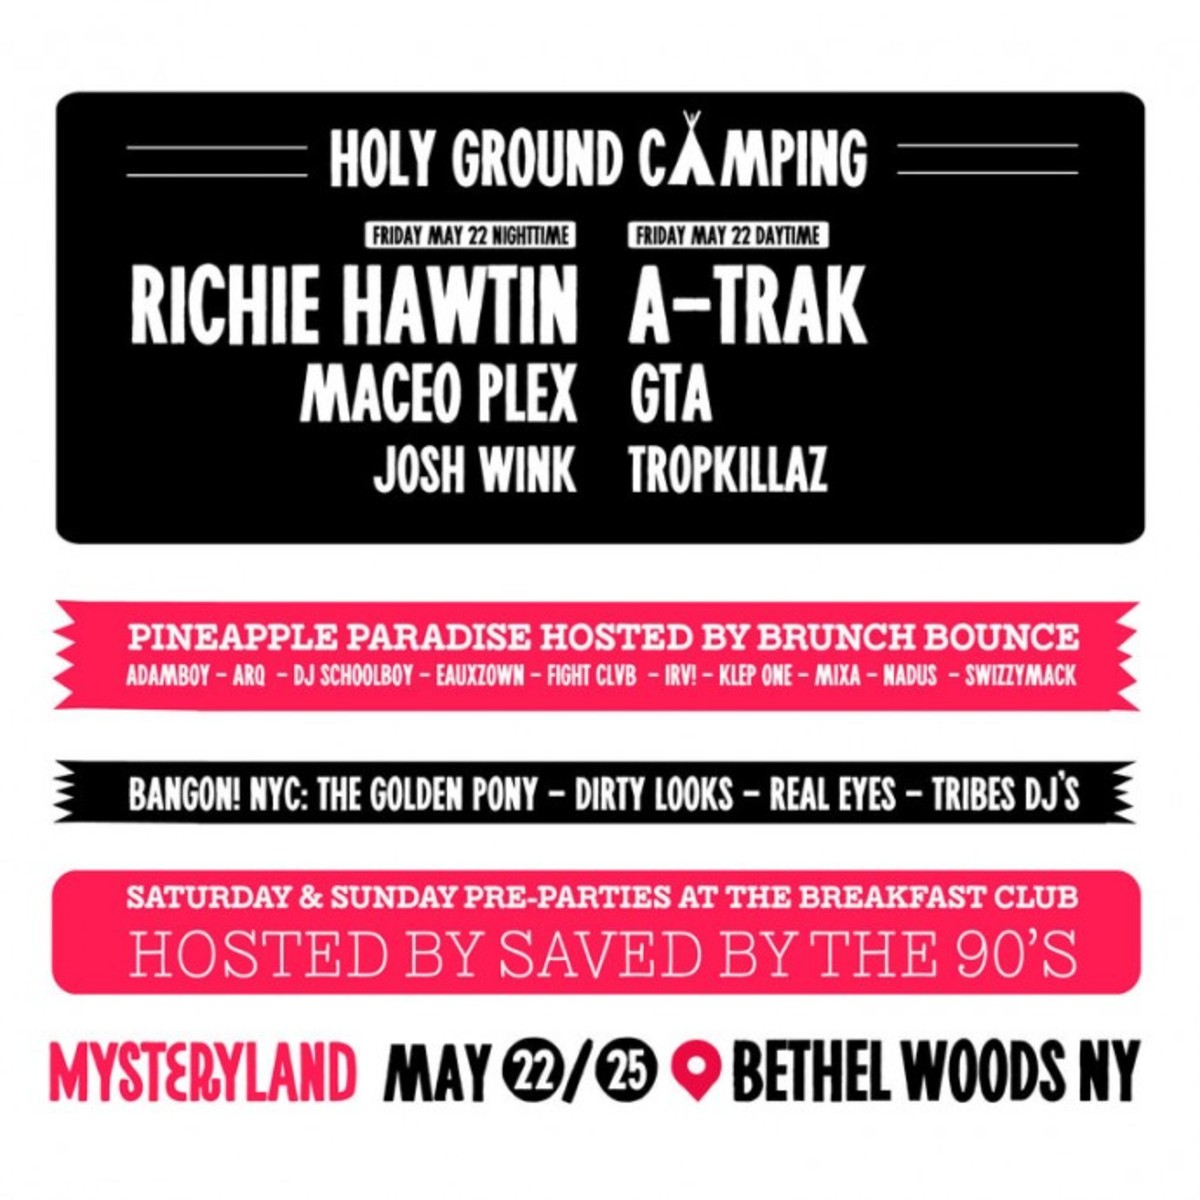 Richie Hawtin & A-Trak Headlining Parties On Woodstock Grounds